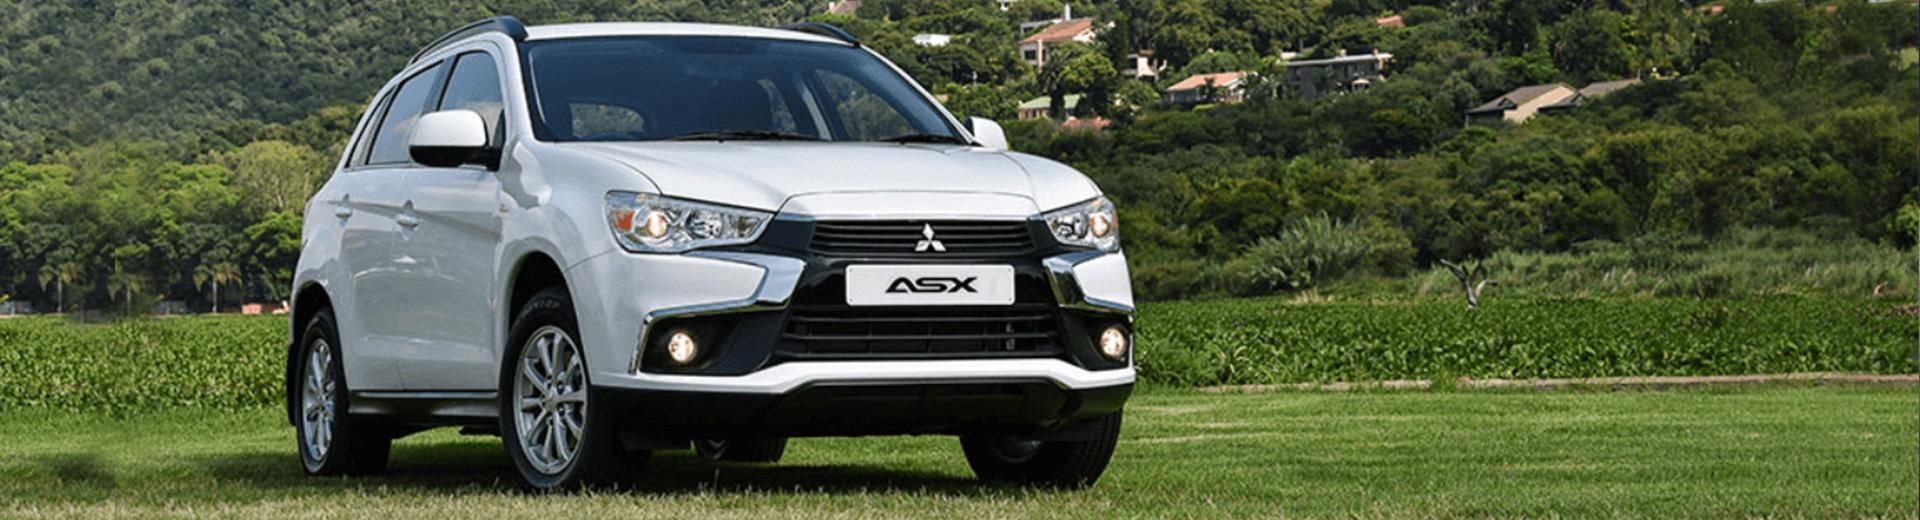 Mitsubishi ASX White - Front View